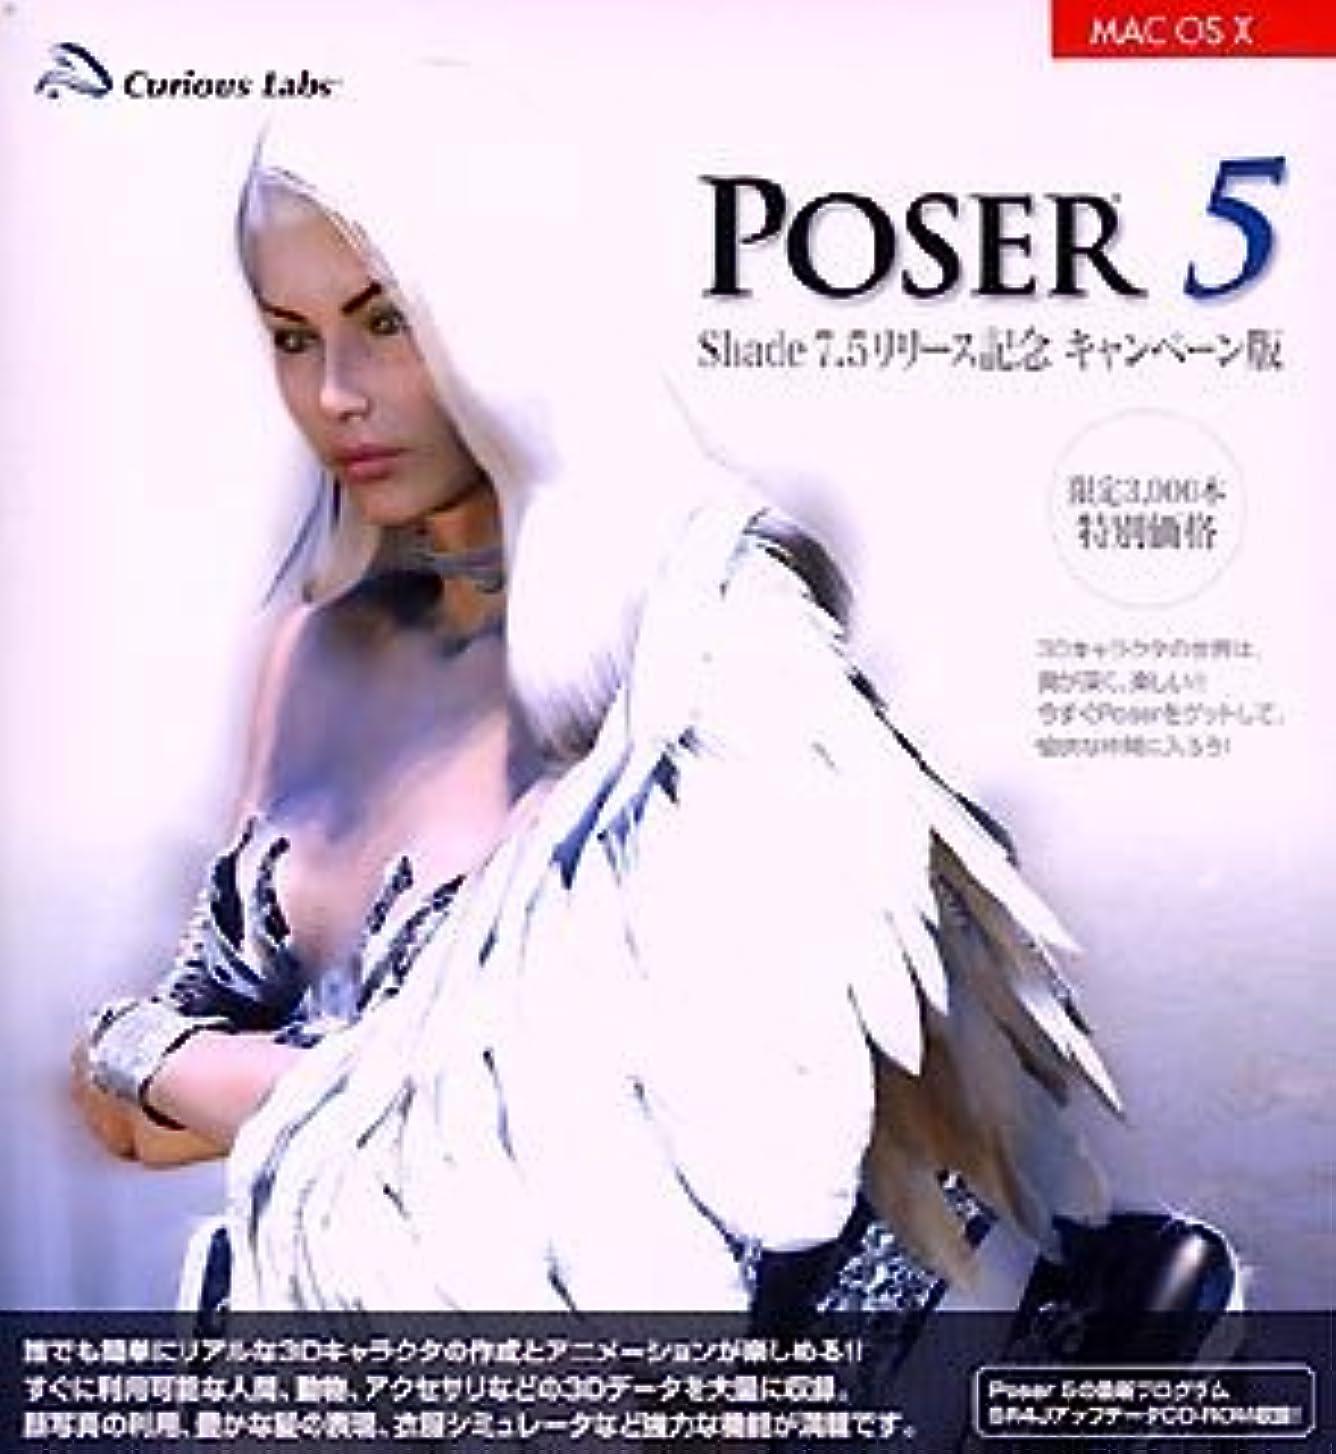 Poser 5 Shade 7.5リリース記念 キャンペーン版 for Mac OS X 日本語版